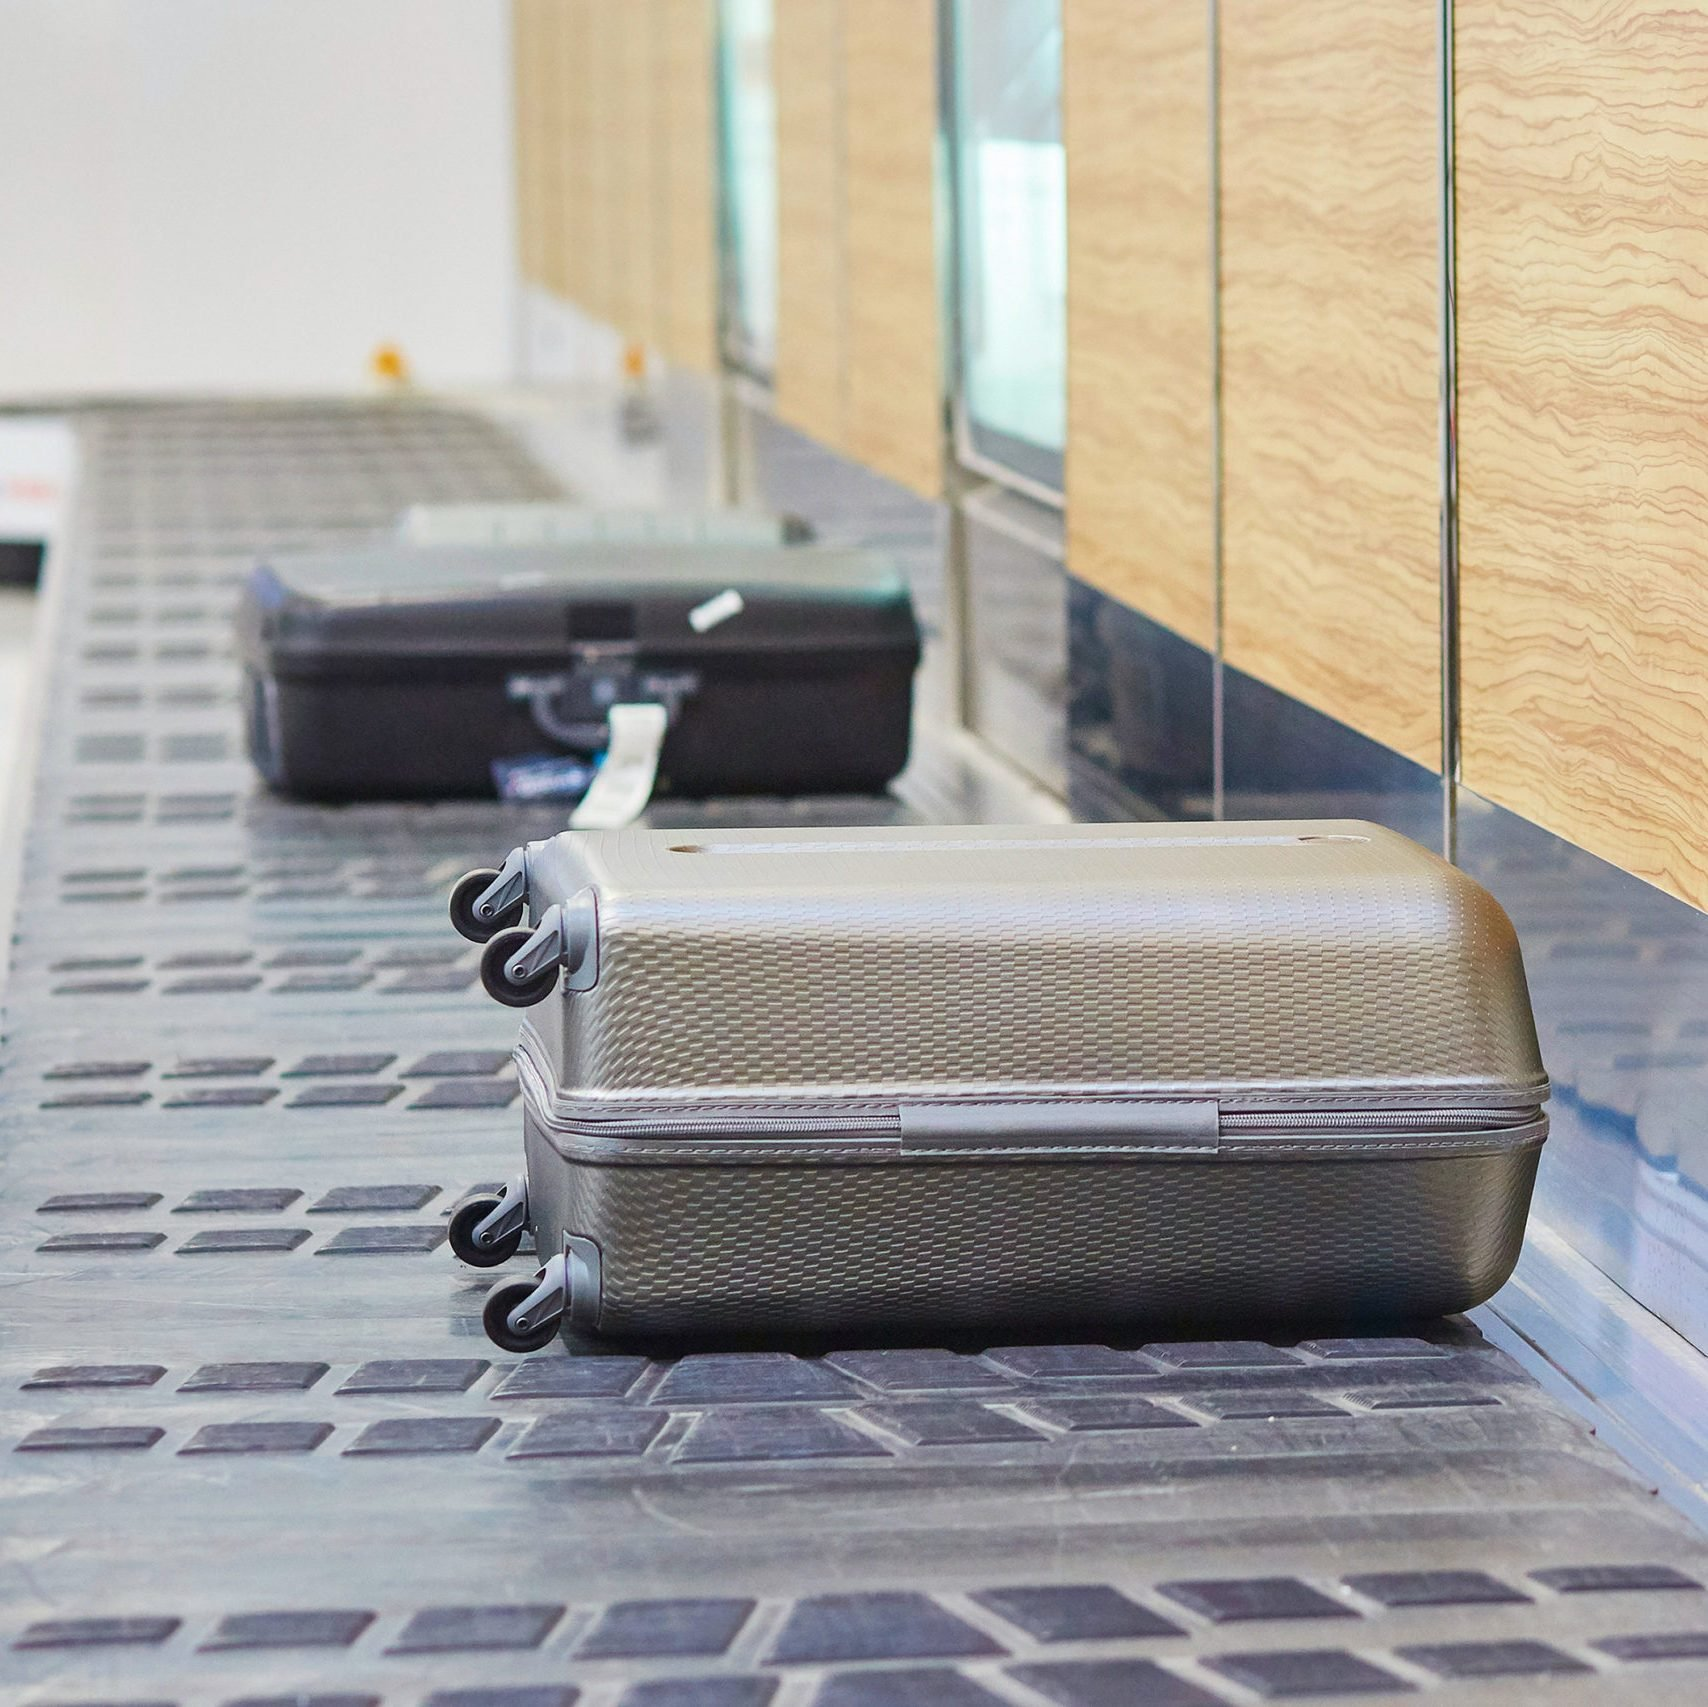 Baggage on conveyor belt